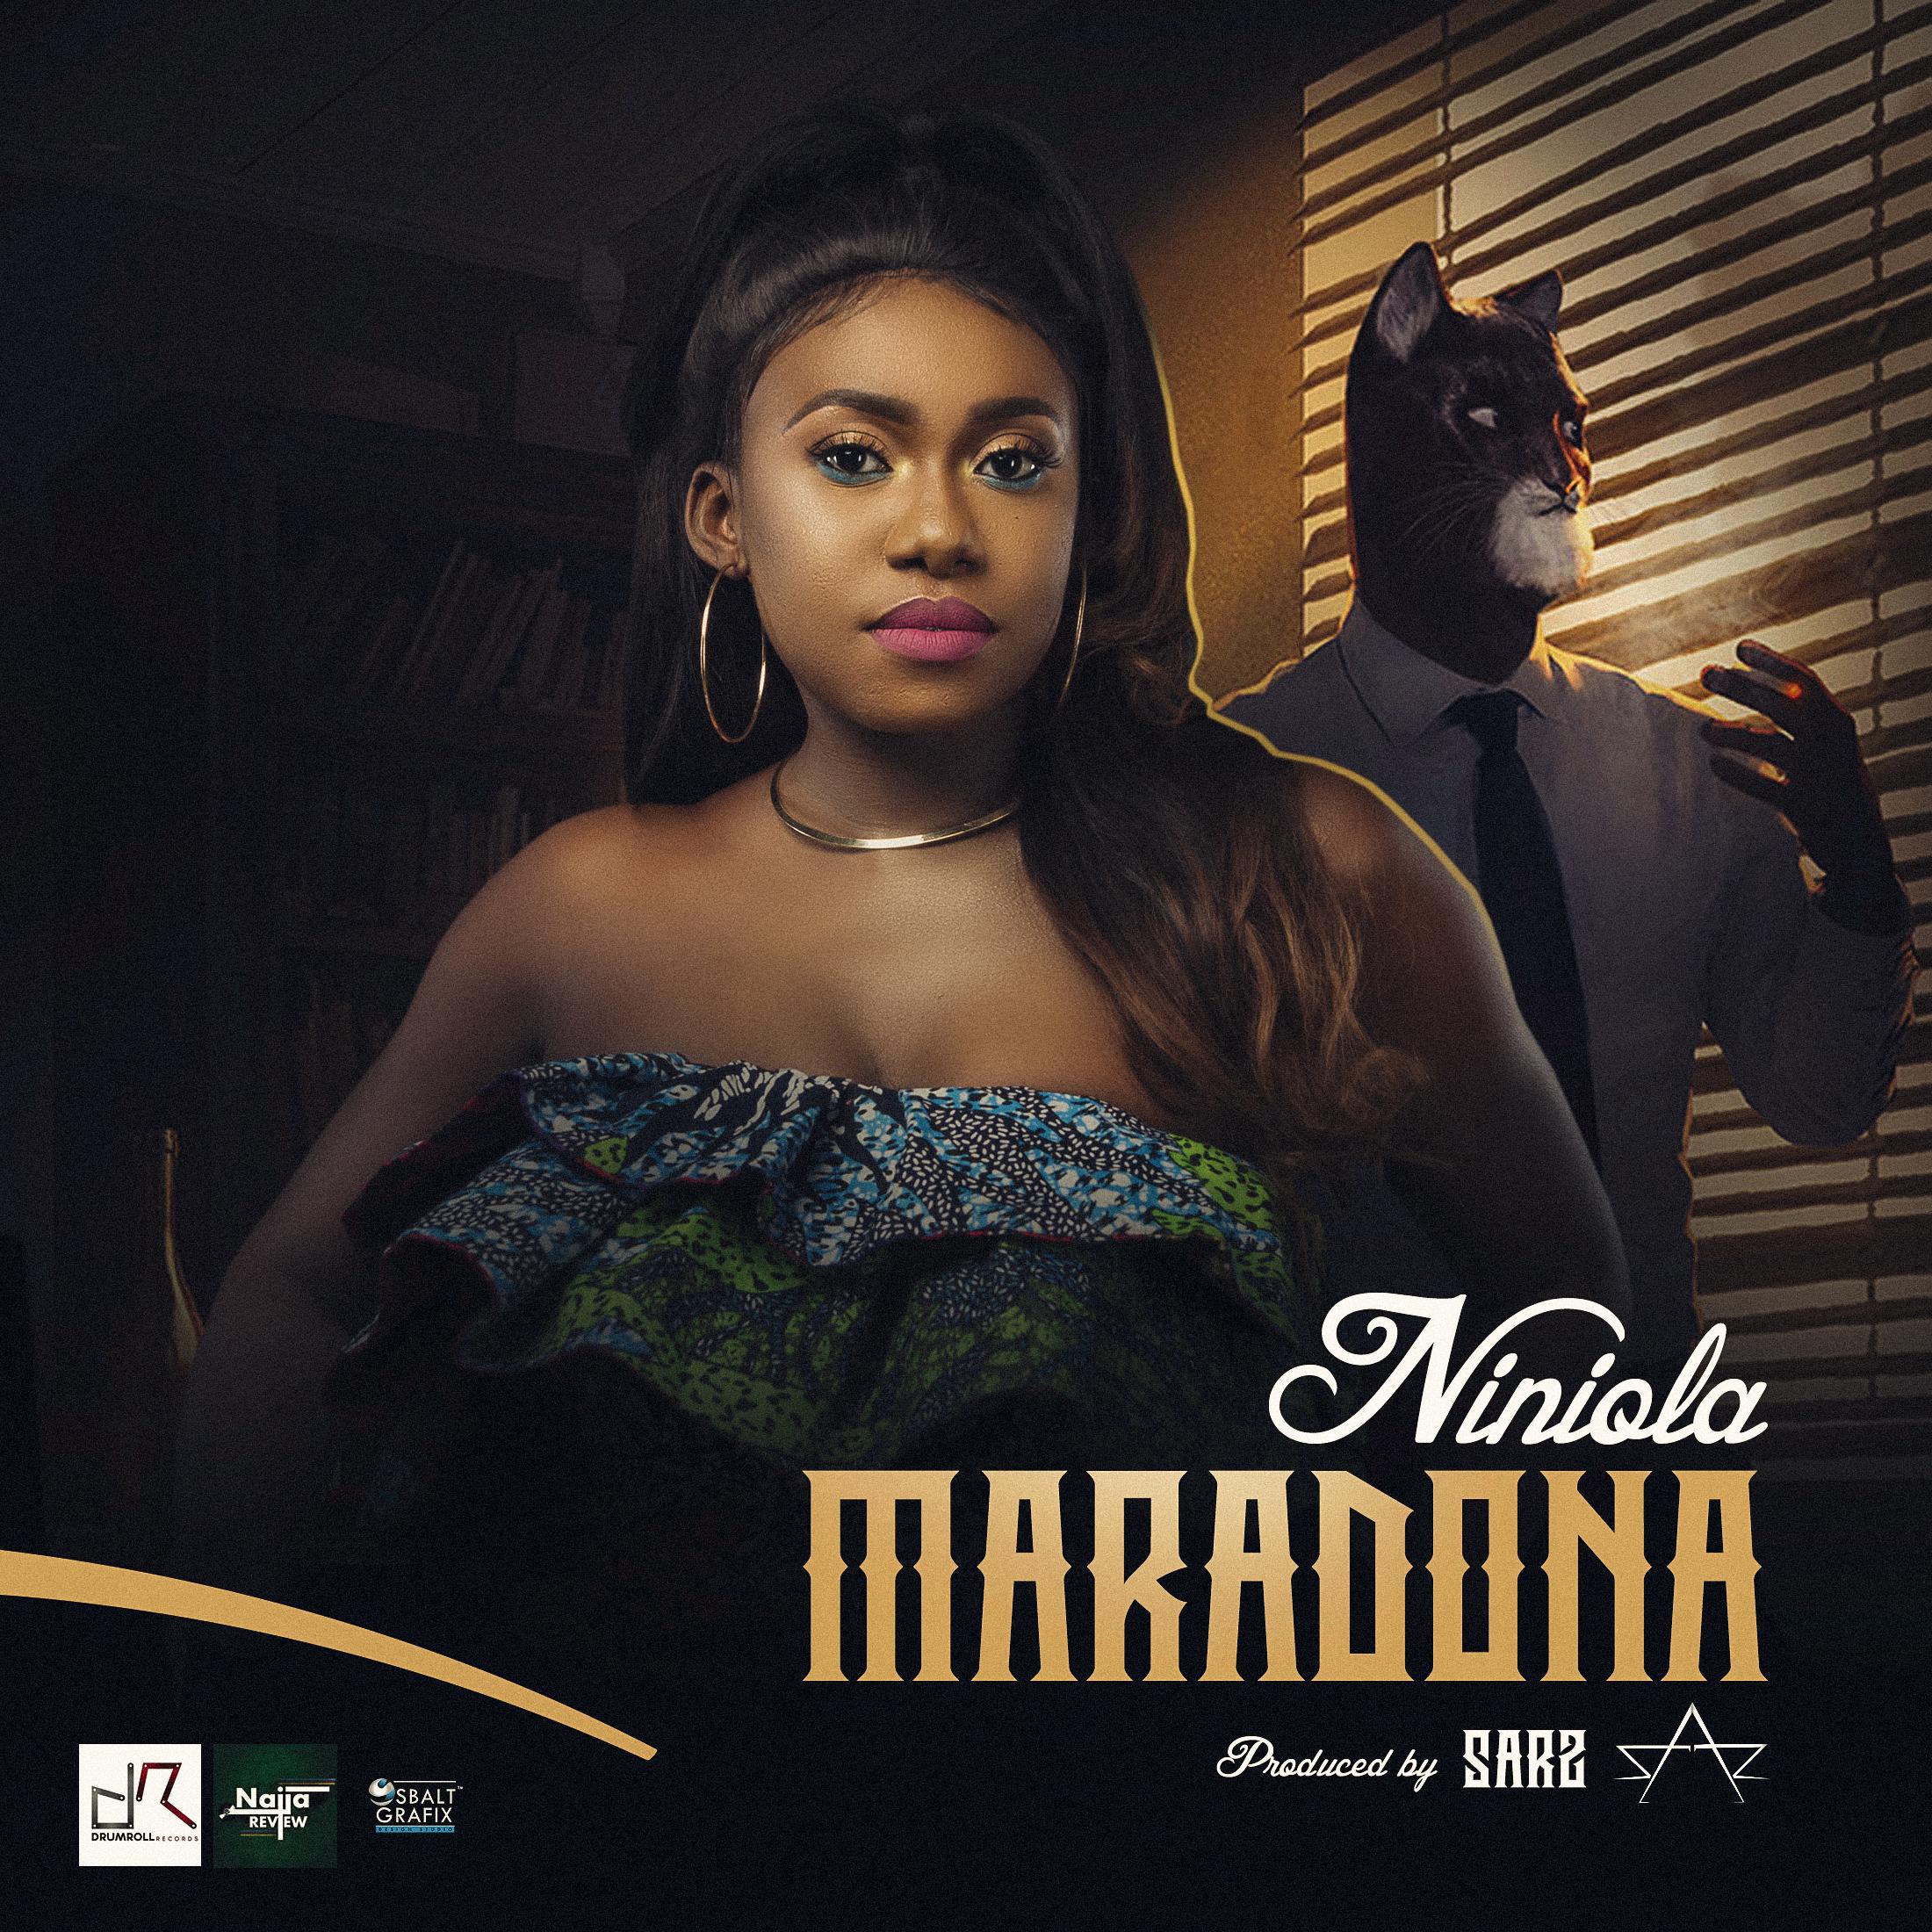 Shakiyaan Song Download Lyrics Mp3: Maradona Song, Mp3 & Music Video